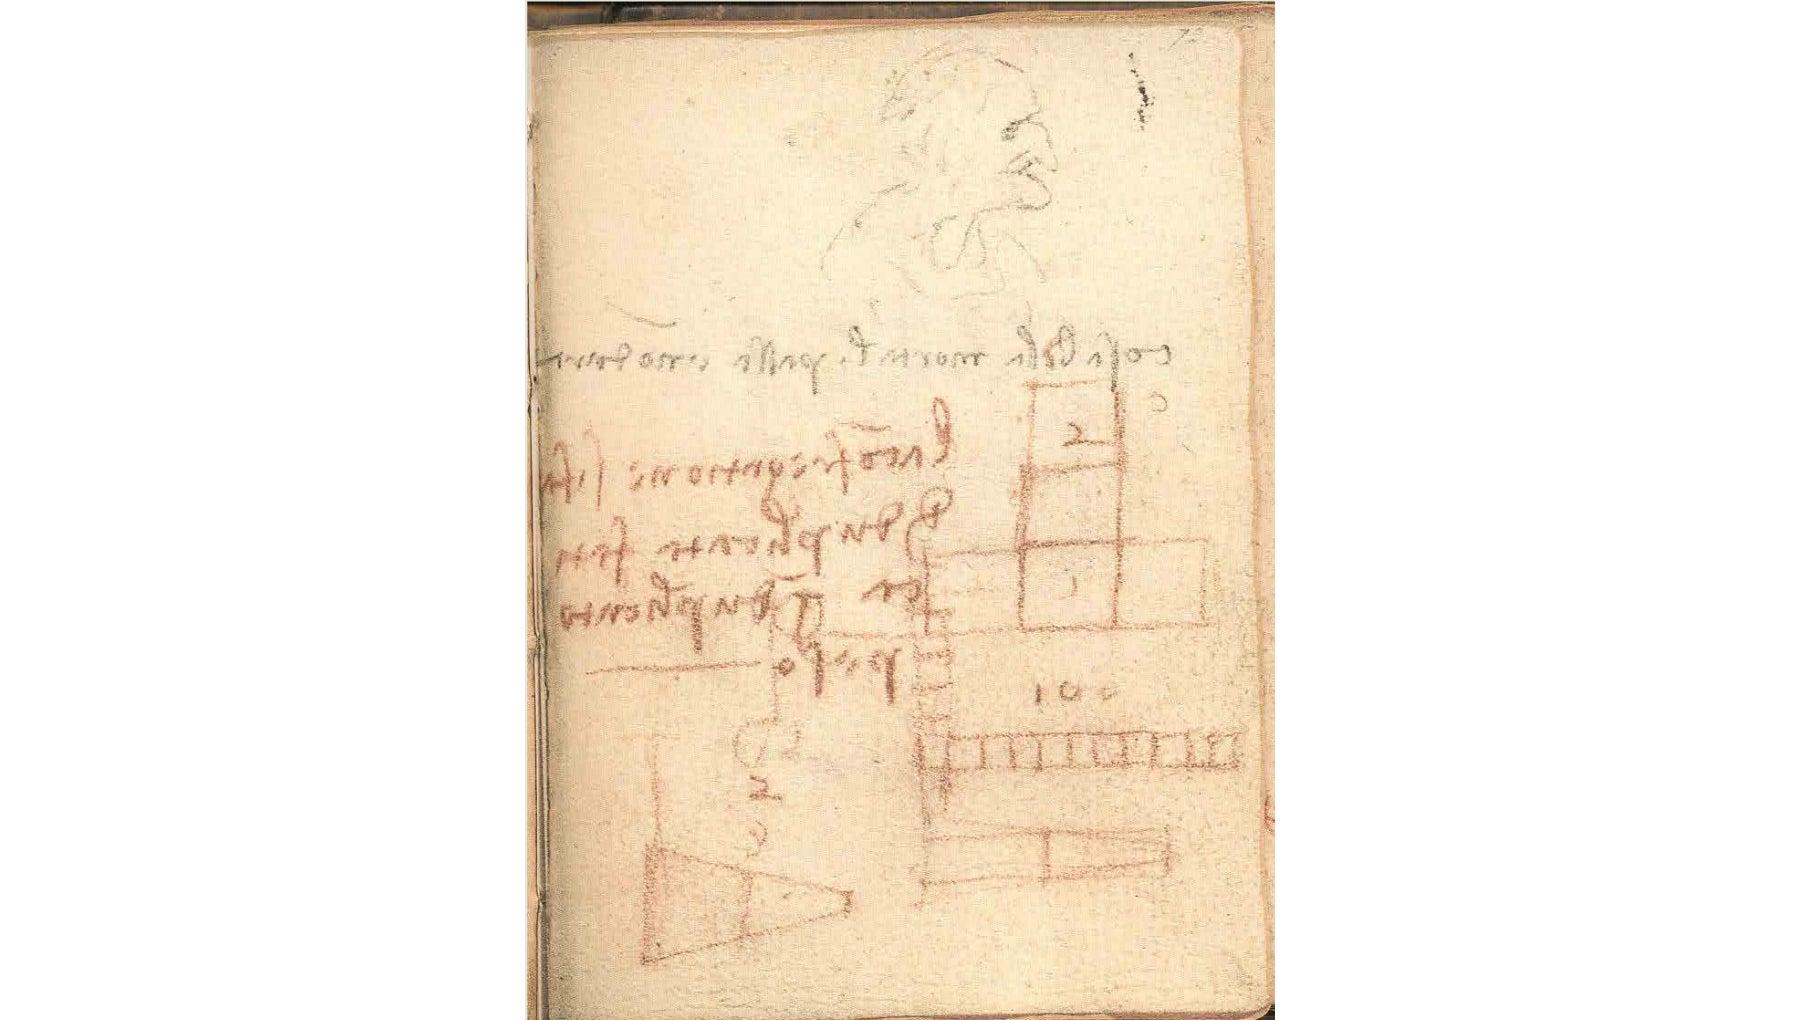 Engineer Discovers Something Amazing In Da Vinci's 'Irrelevant Scribbles'